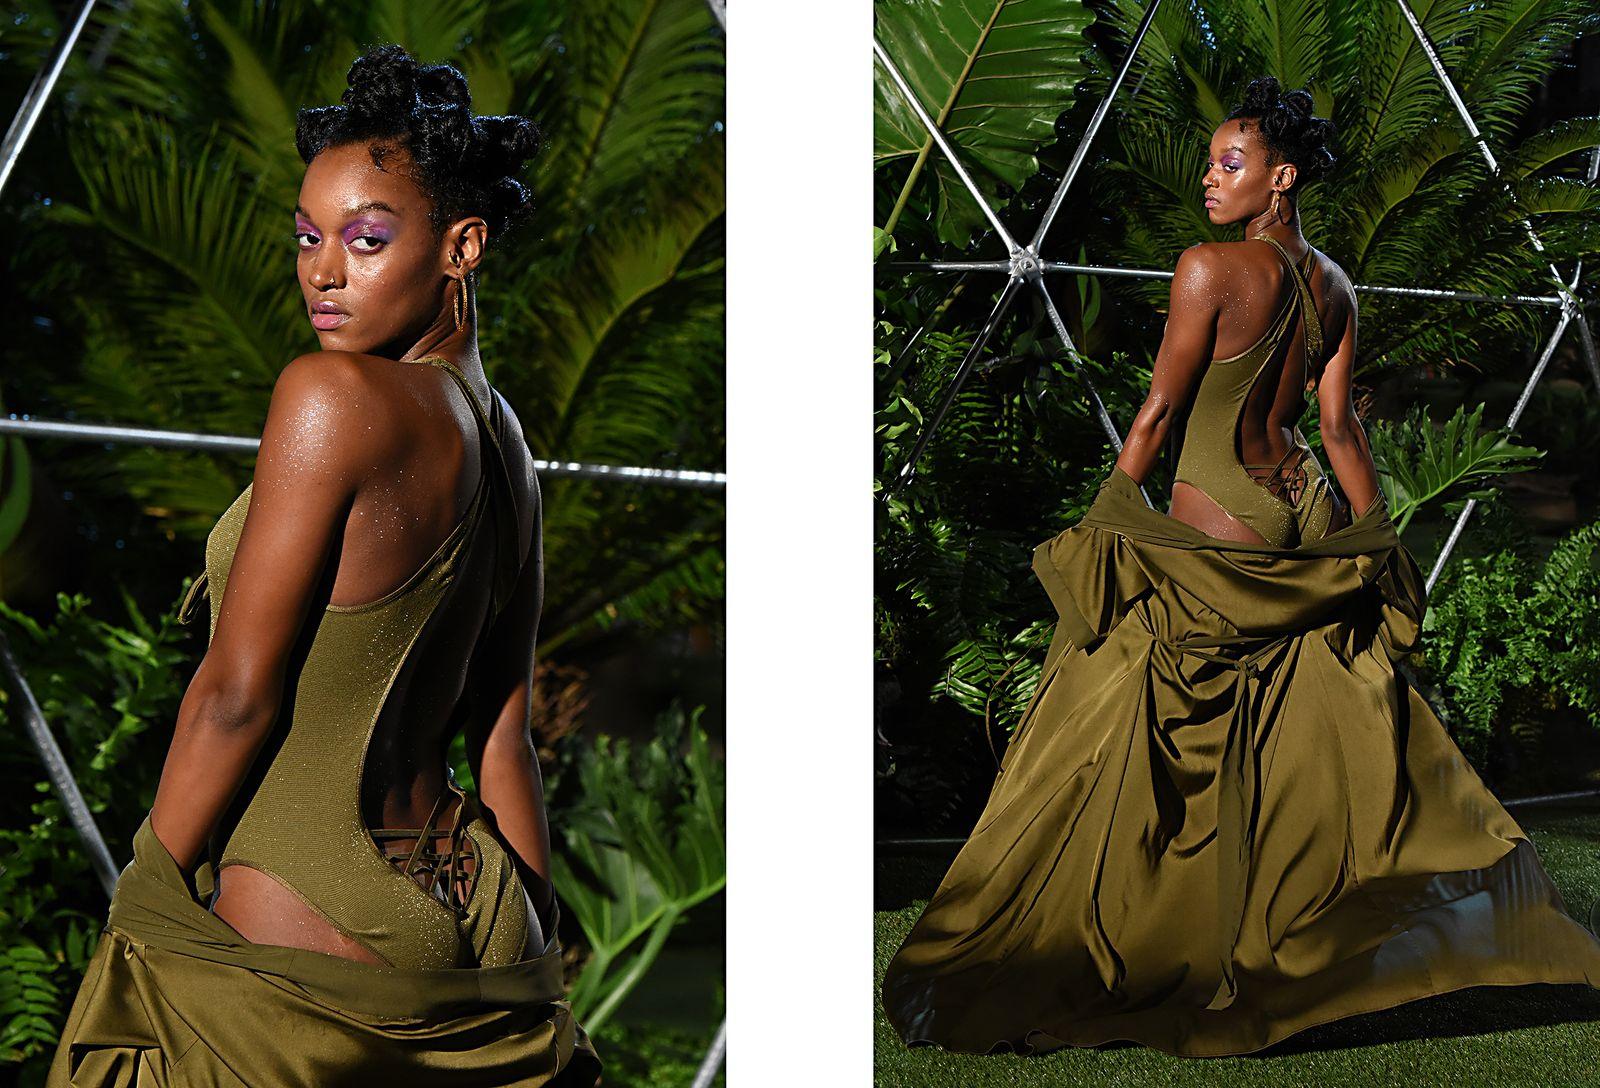 SAVAGE X FENTY | Lingerie by Rihanna